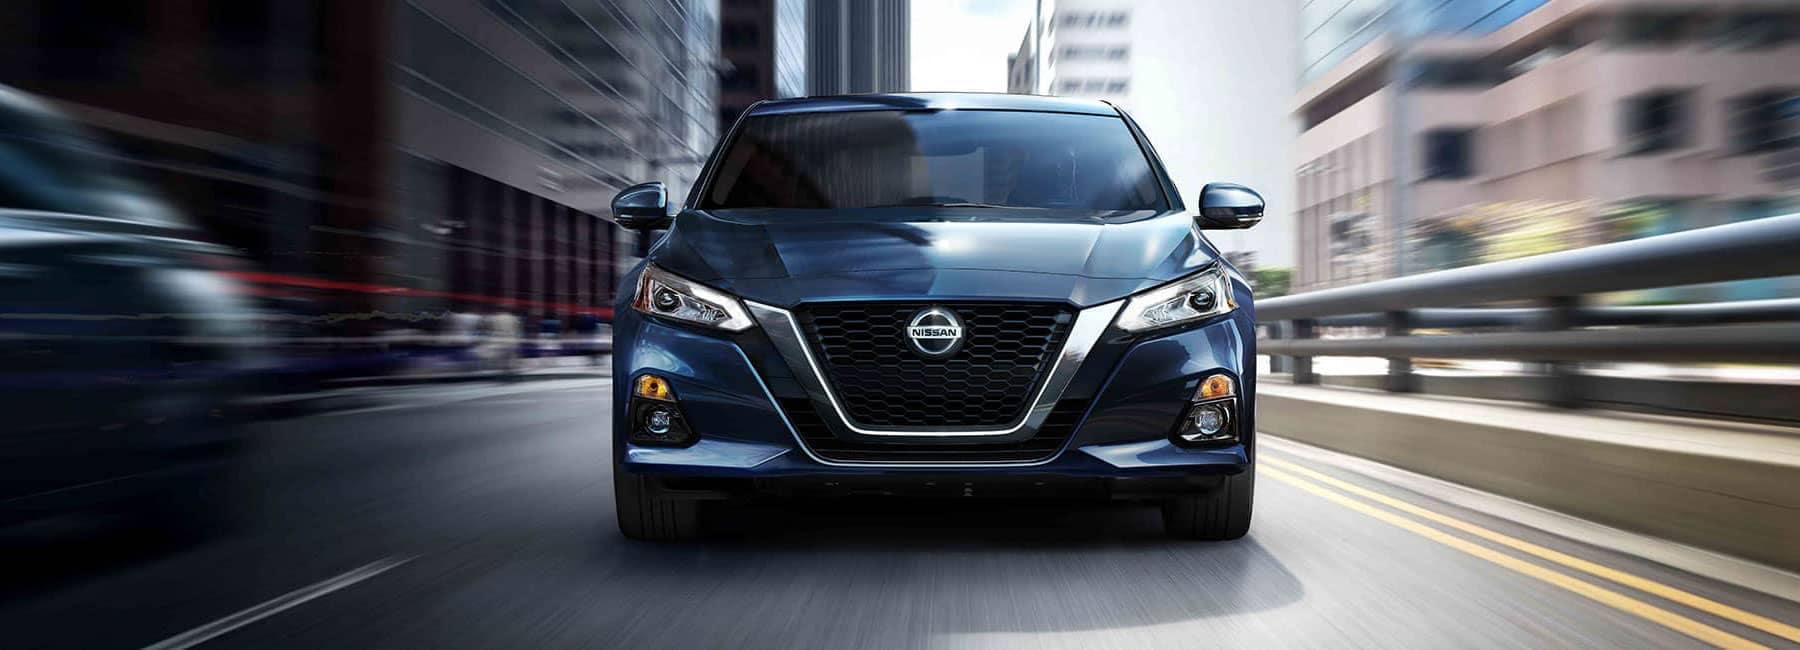 2019 Blue Nissan Altima straight on